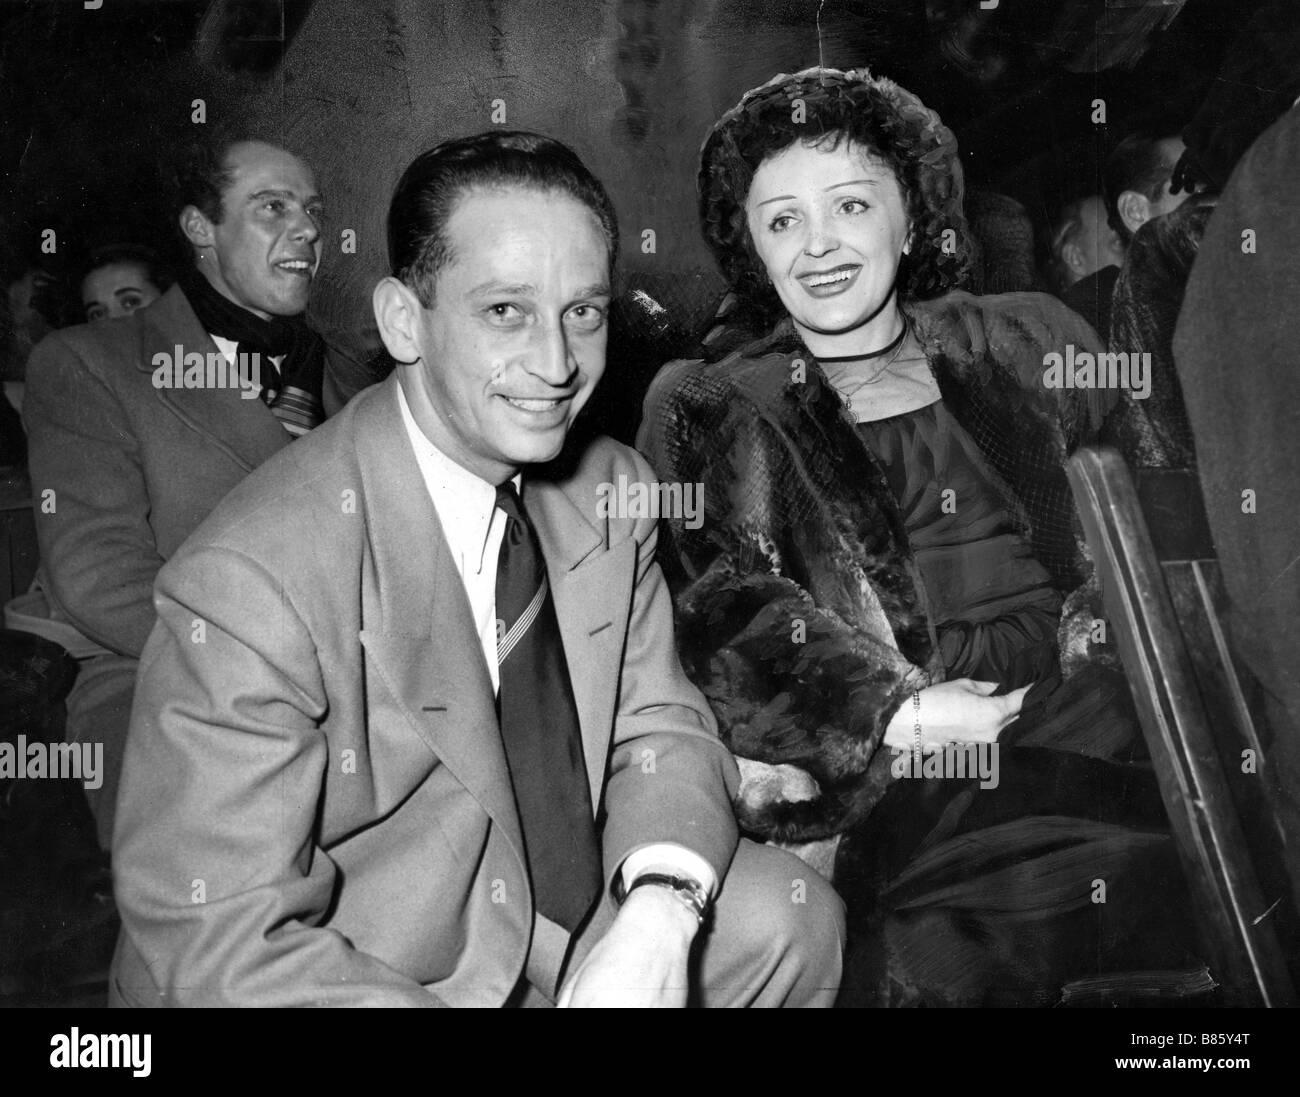 Piaf und Jean-louis Jaubert, 1948 Stockbild